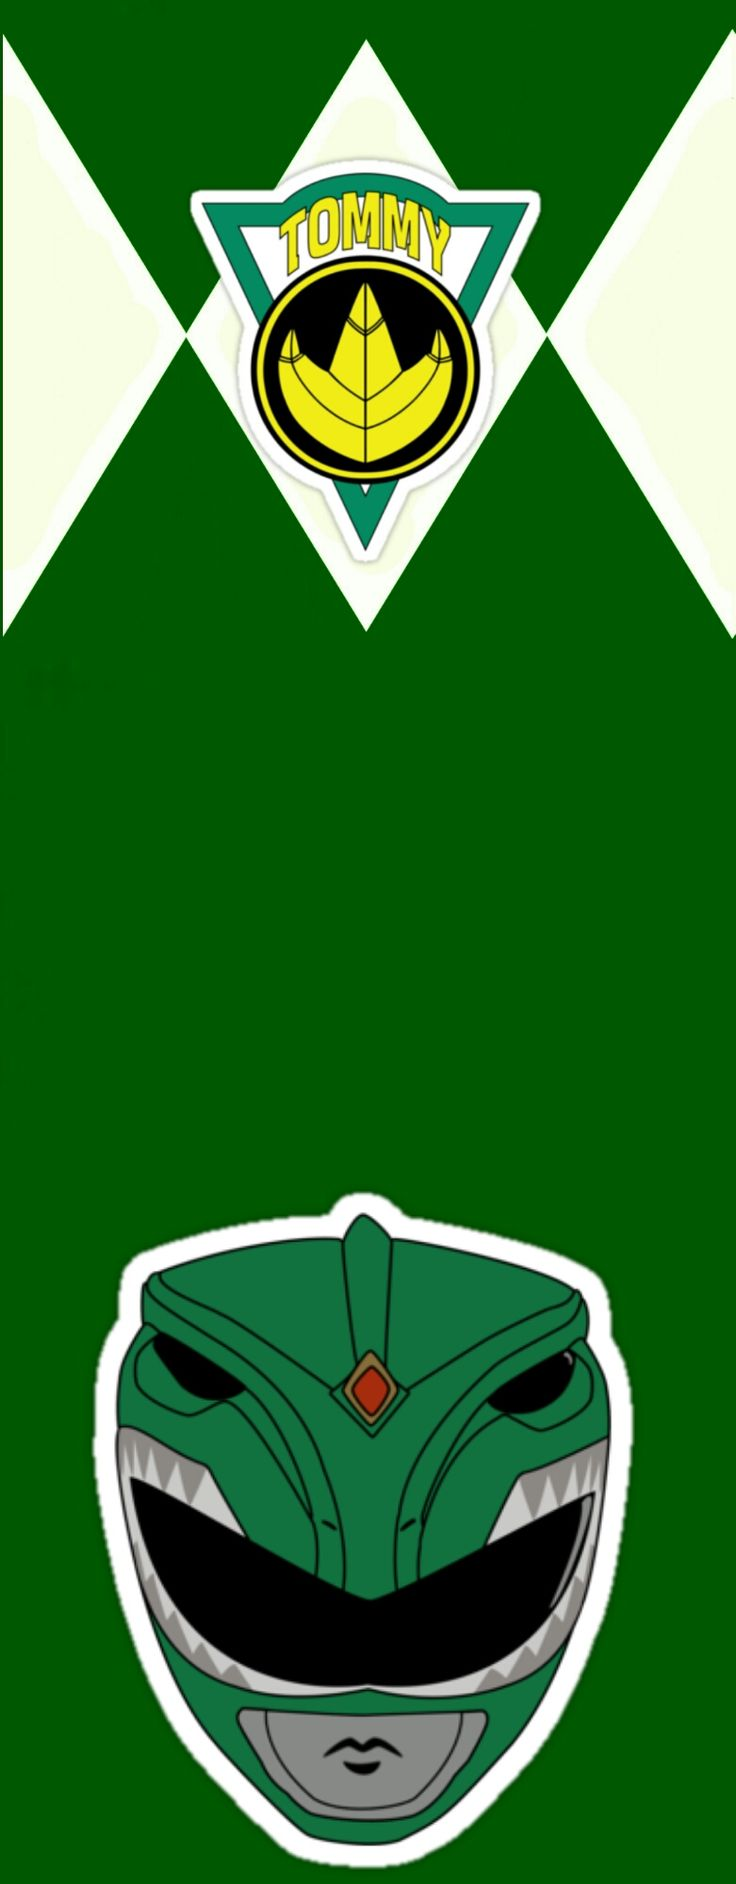 Green Ranger by eddieduffield19.deviantart.com on @DeviantArt